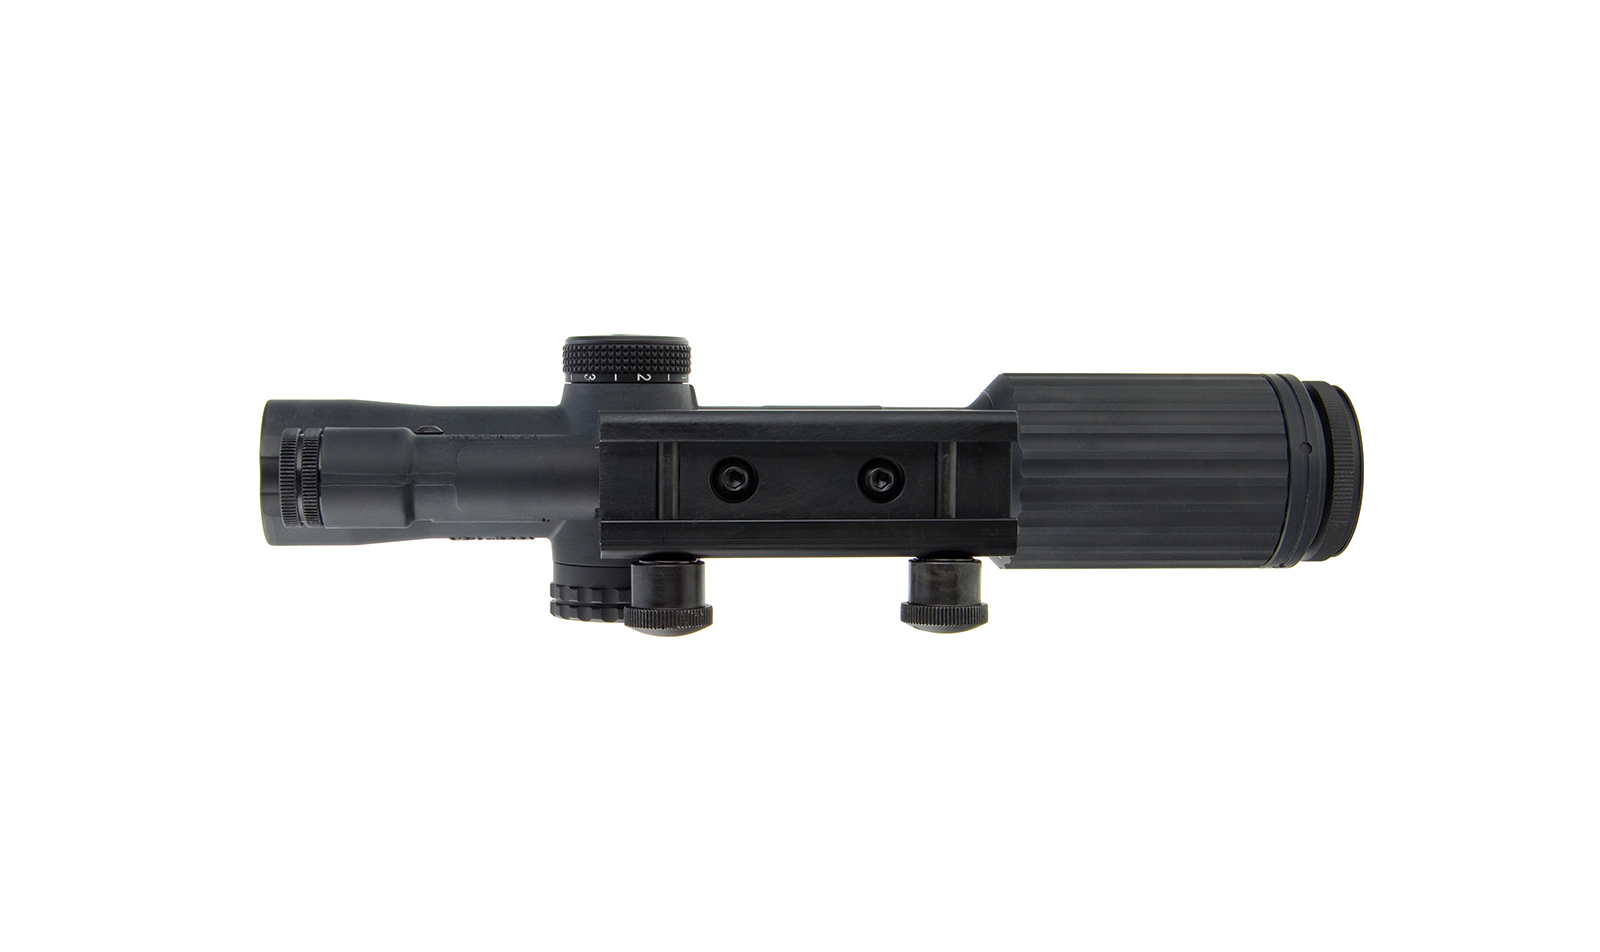 VC16-C-1600000 angle 10